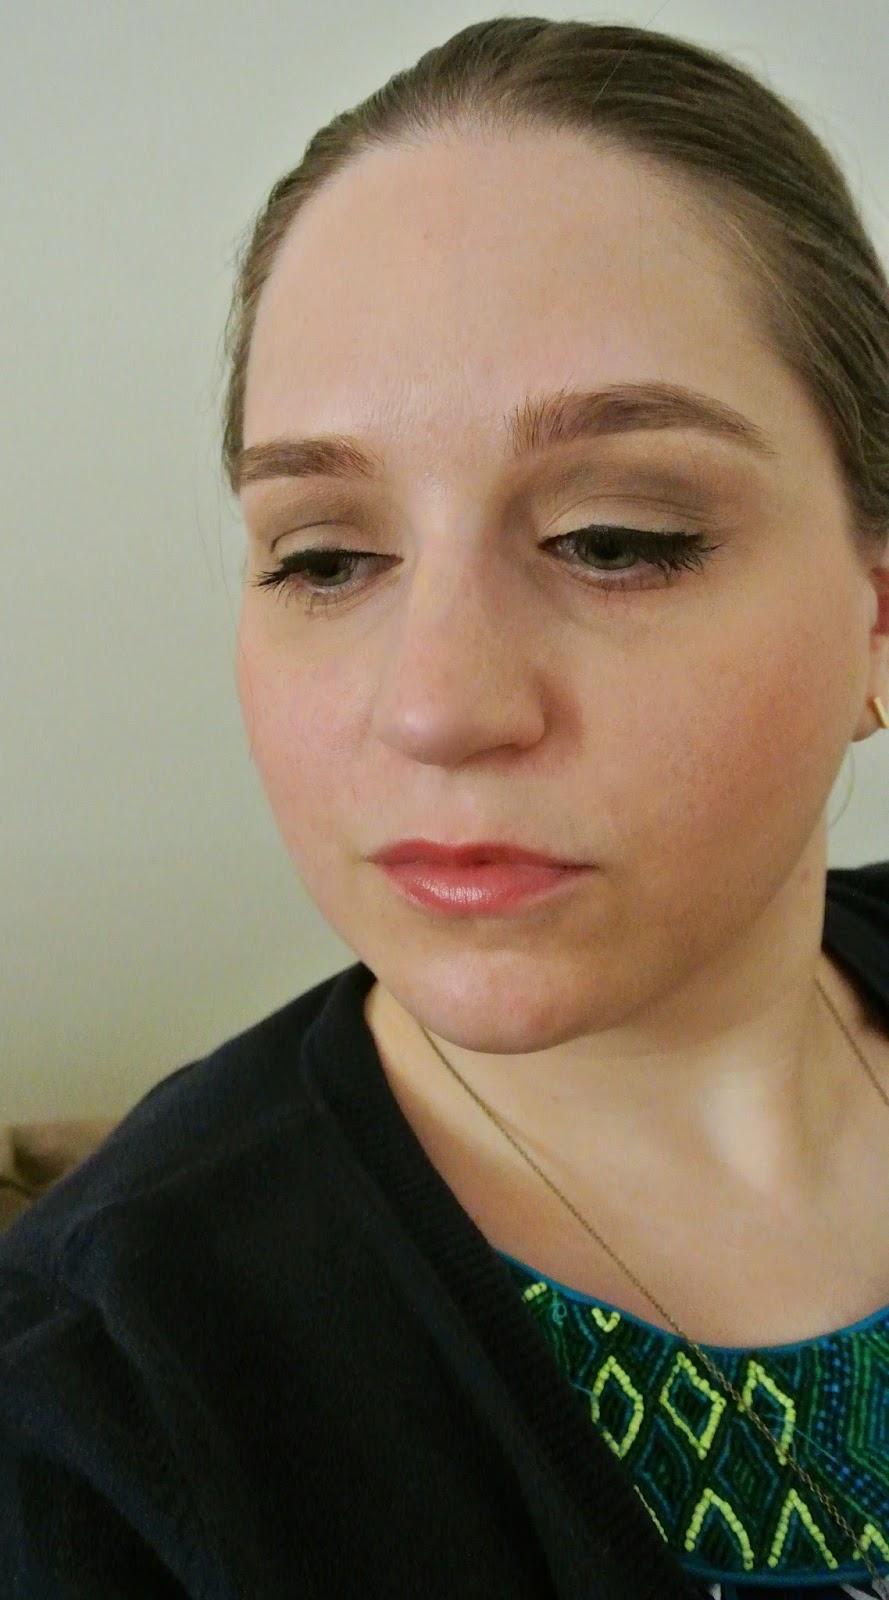 Lipstick & Black Eyeliner